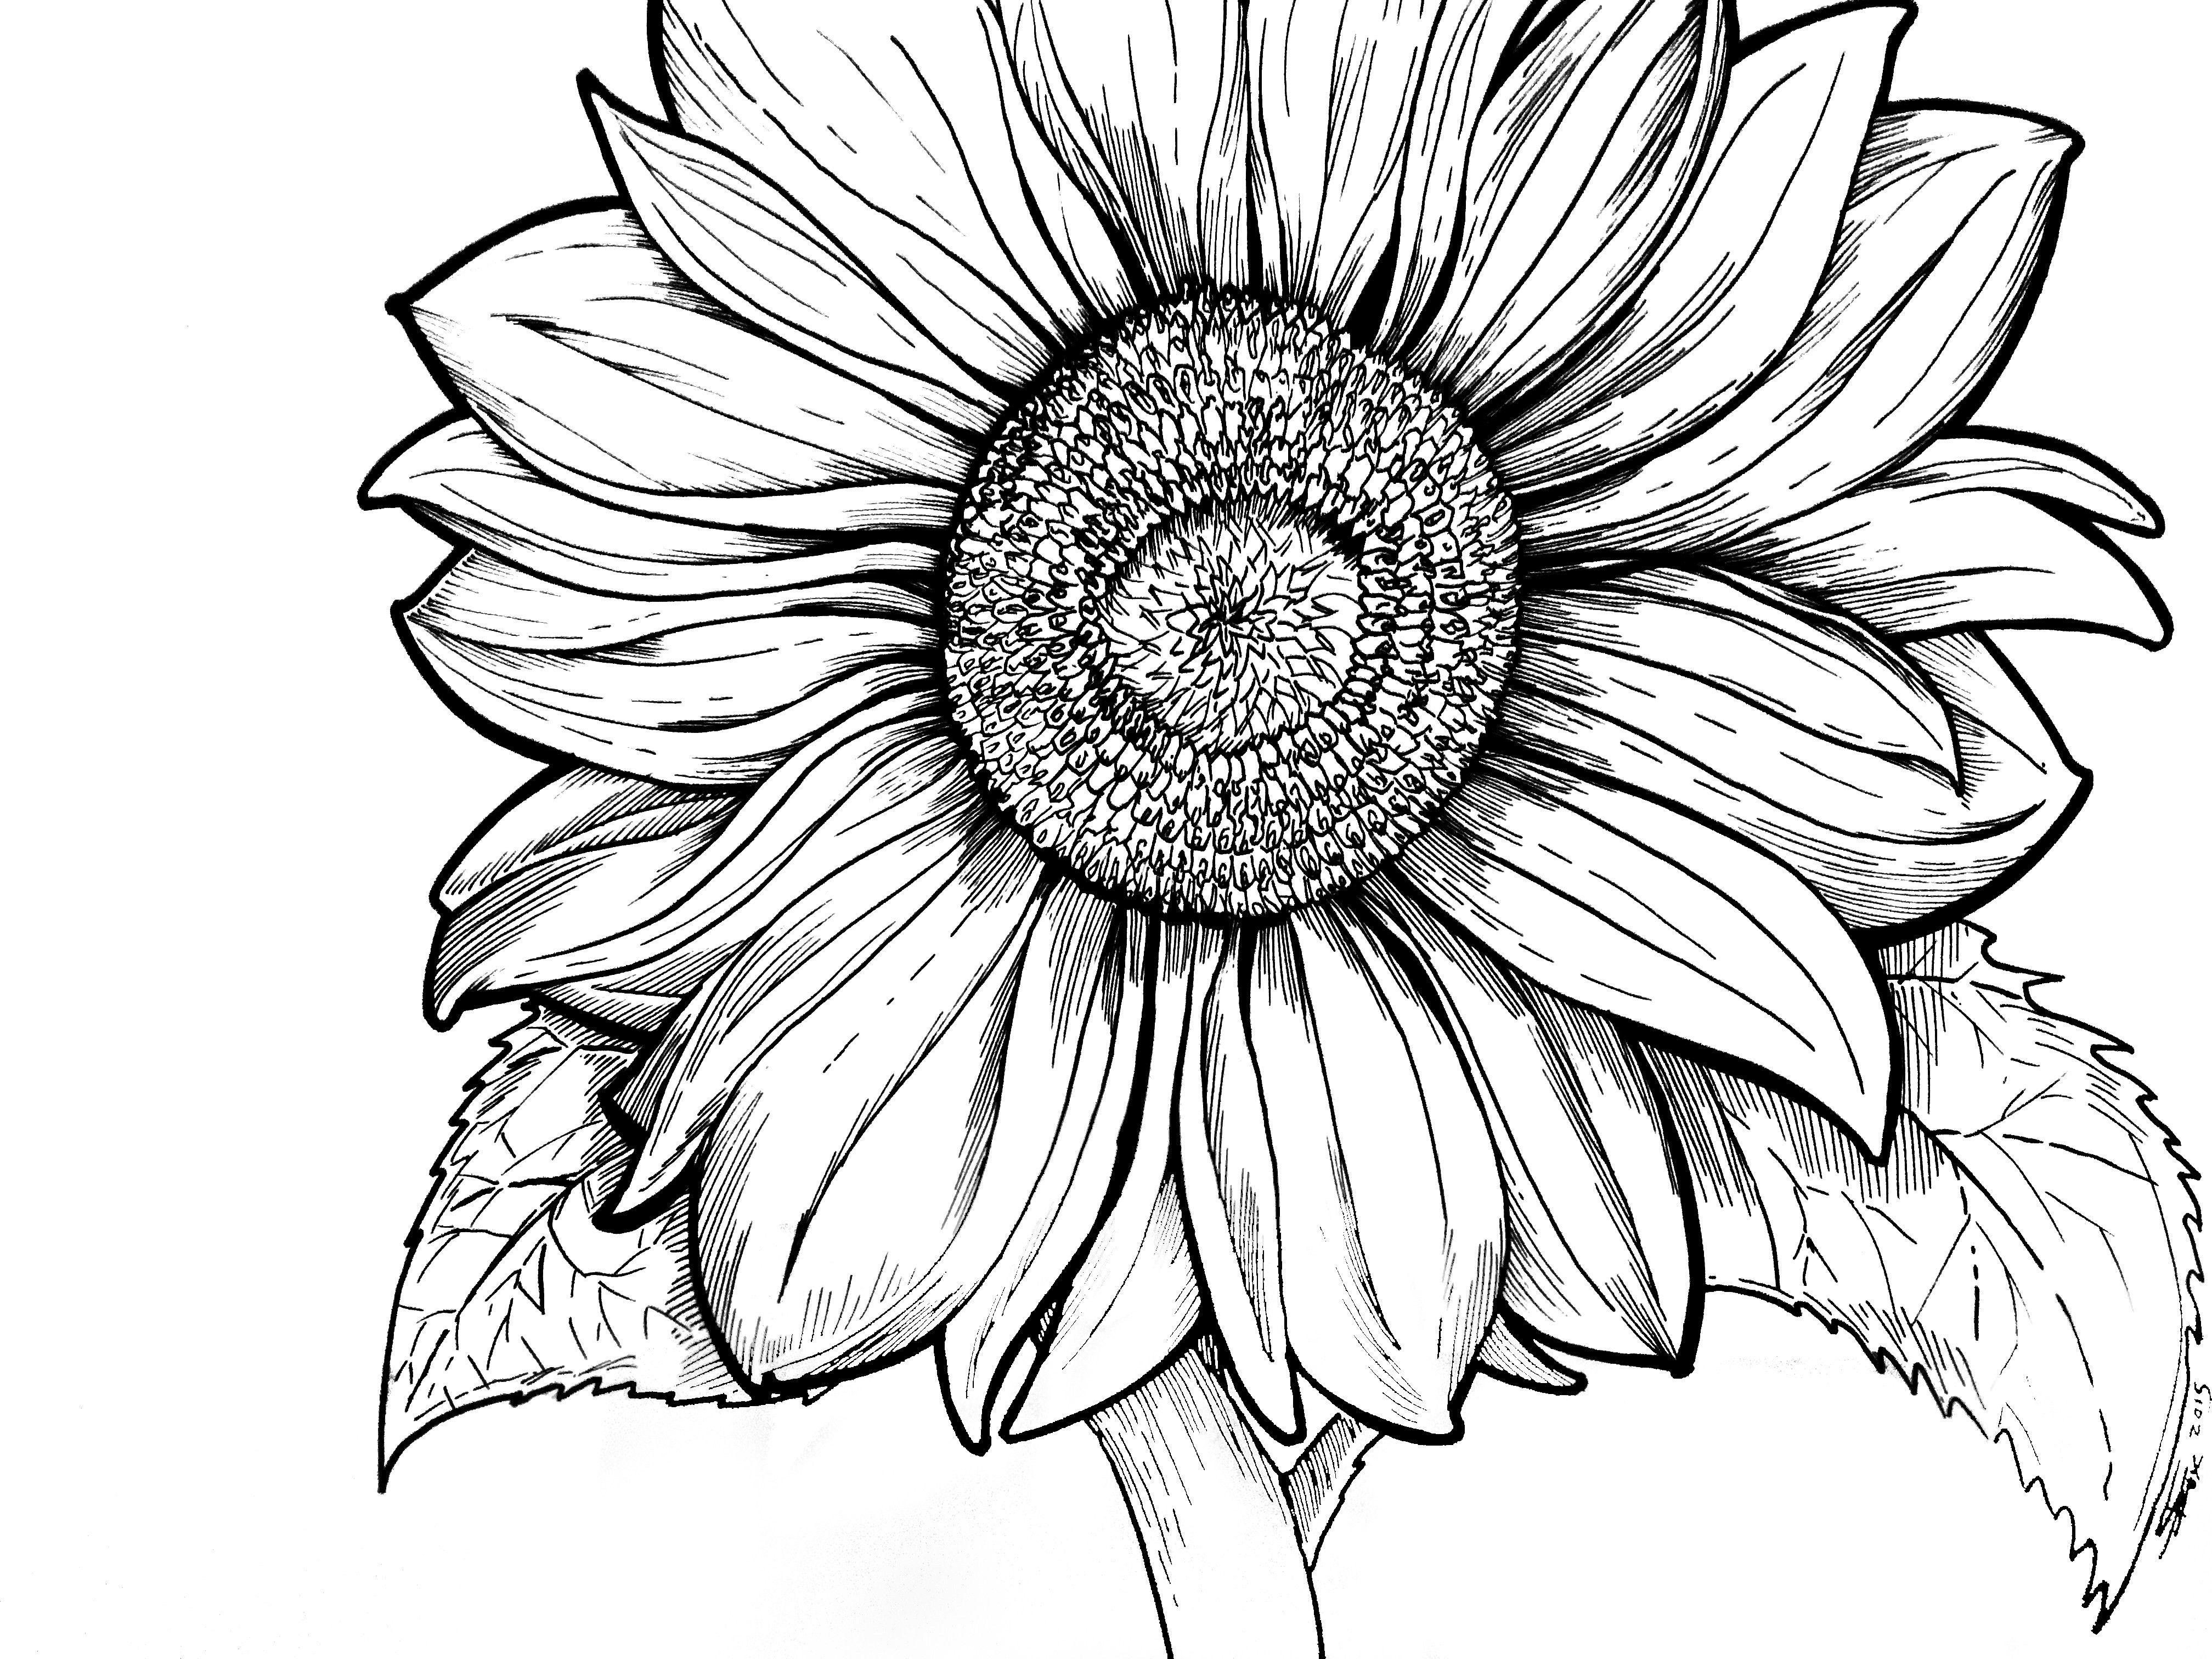 11 Sunflower Coloring Pages Sunflower Coloring Pages Coloring Pages Printable Flower Coloring Pages